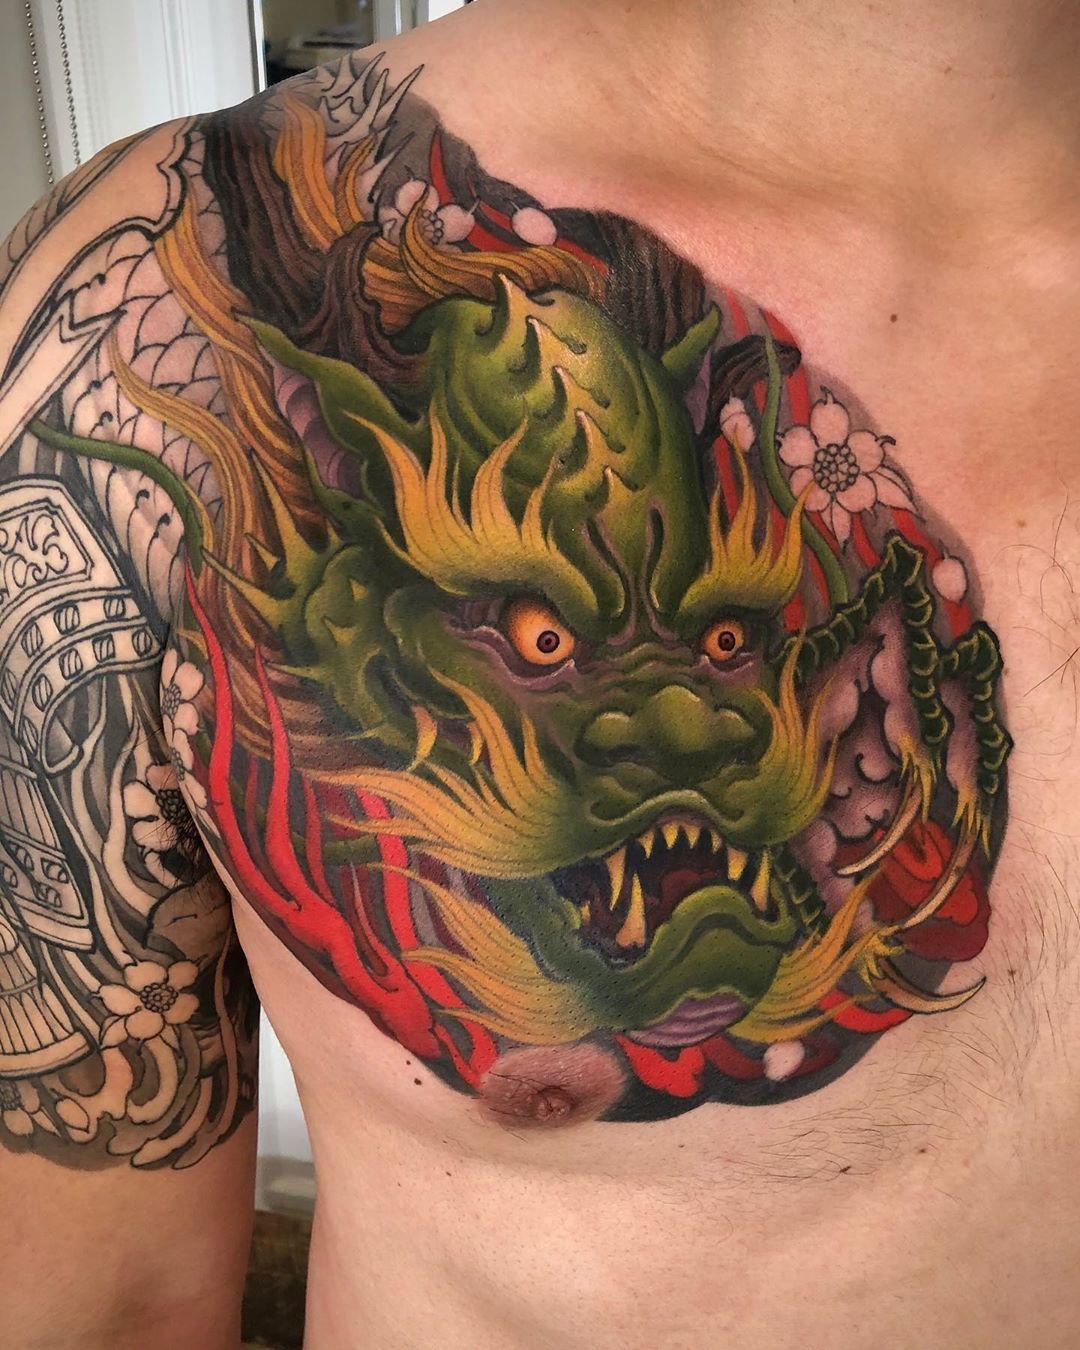 dragon. #art #picoftheday #torontoart #ink #torontotattoo #mithraneedle #toronto #tattoo #tattoos #c